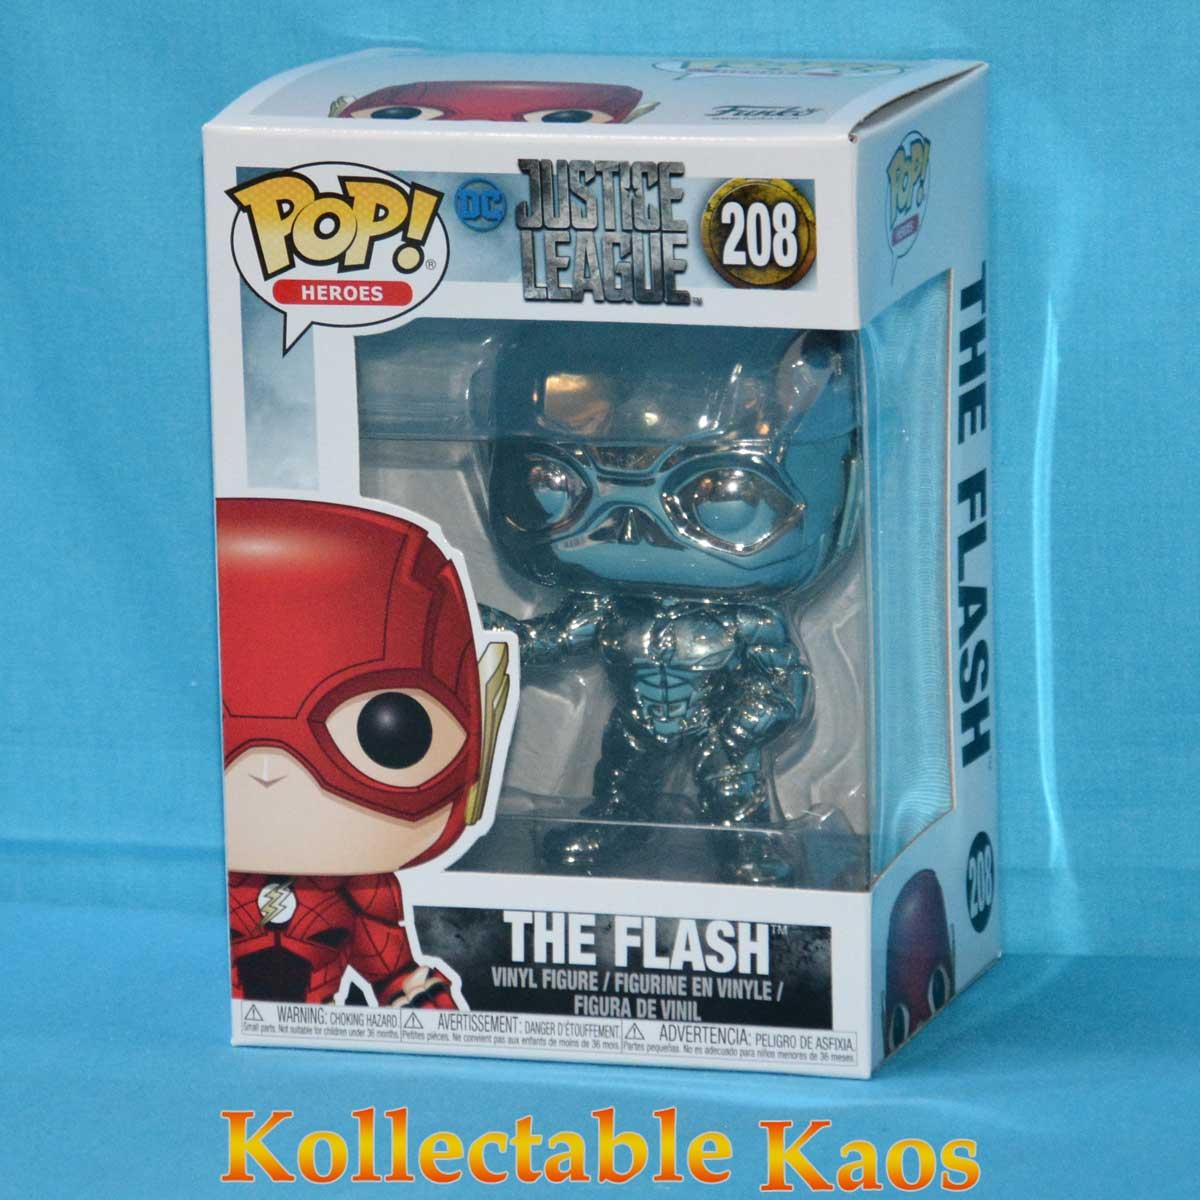 Justice League 2017 The Flash Hematite Black Chrome Pop Vinyl Figure 208 Kollectable Kaos